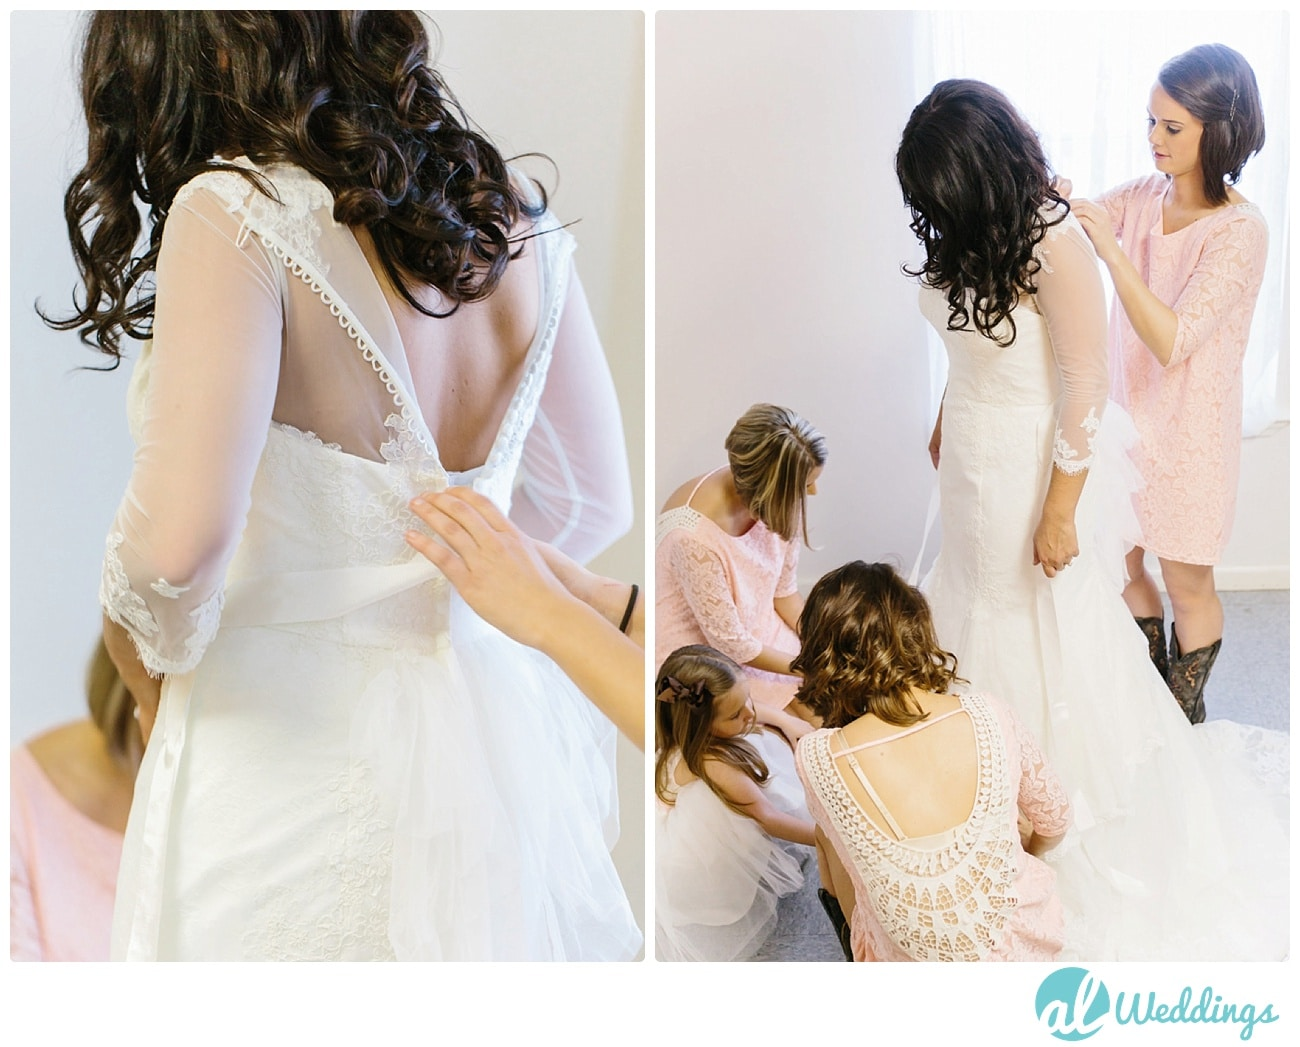 Austin Wedding | Hidden Meadows Vineyard | Alabama Wedding Photographer-24.jpg